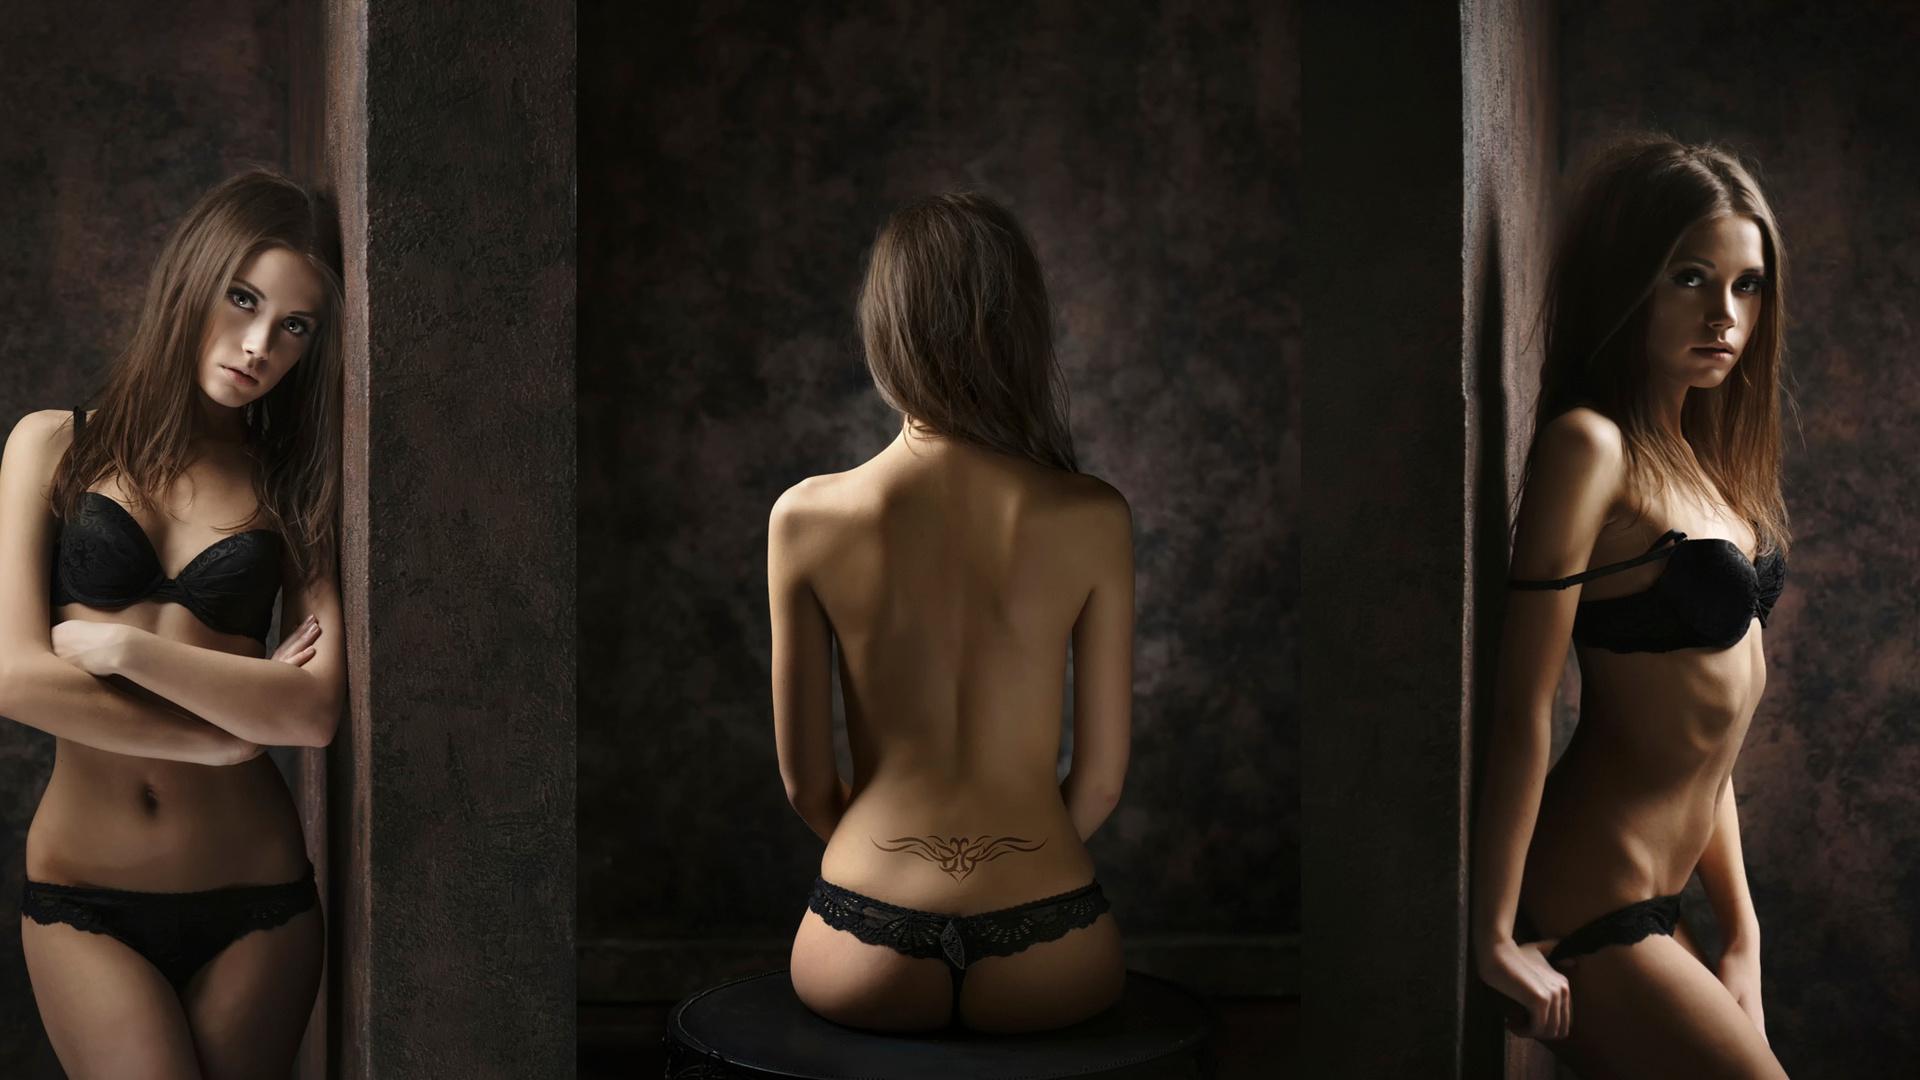 Erotic Video Порно Видеочат ua - Эротические Секс Видео Камеры Онлайн